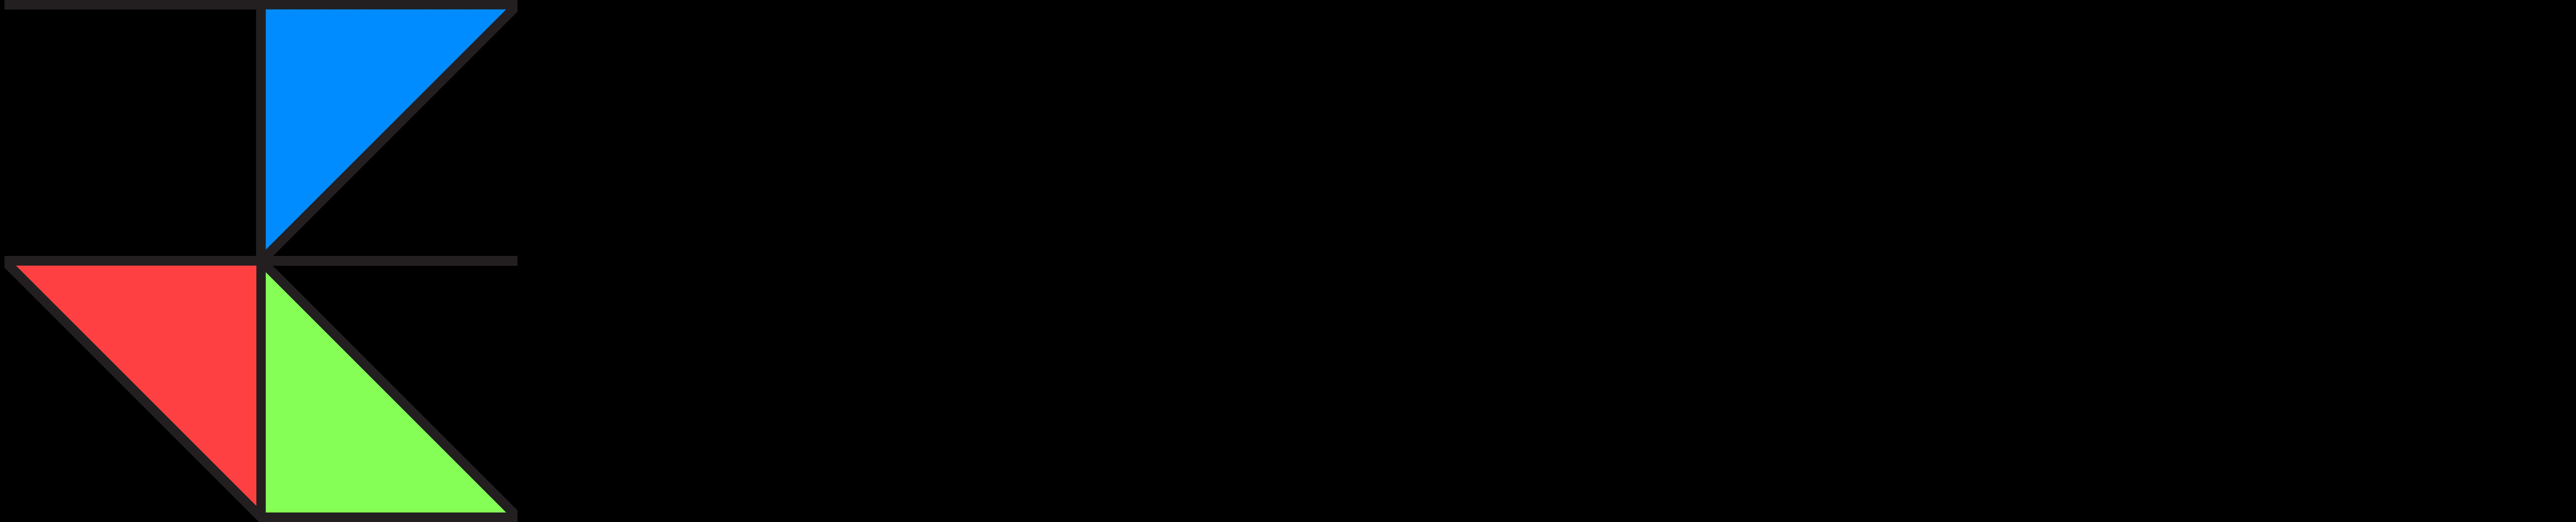 KENNYBRAND